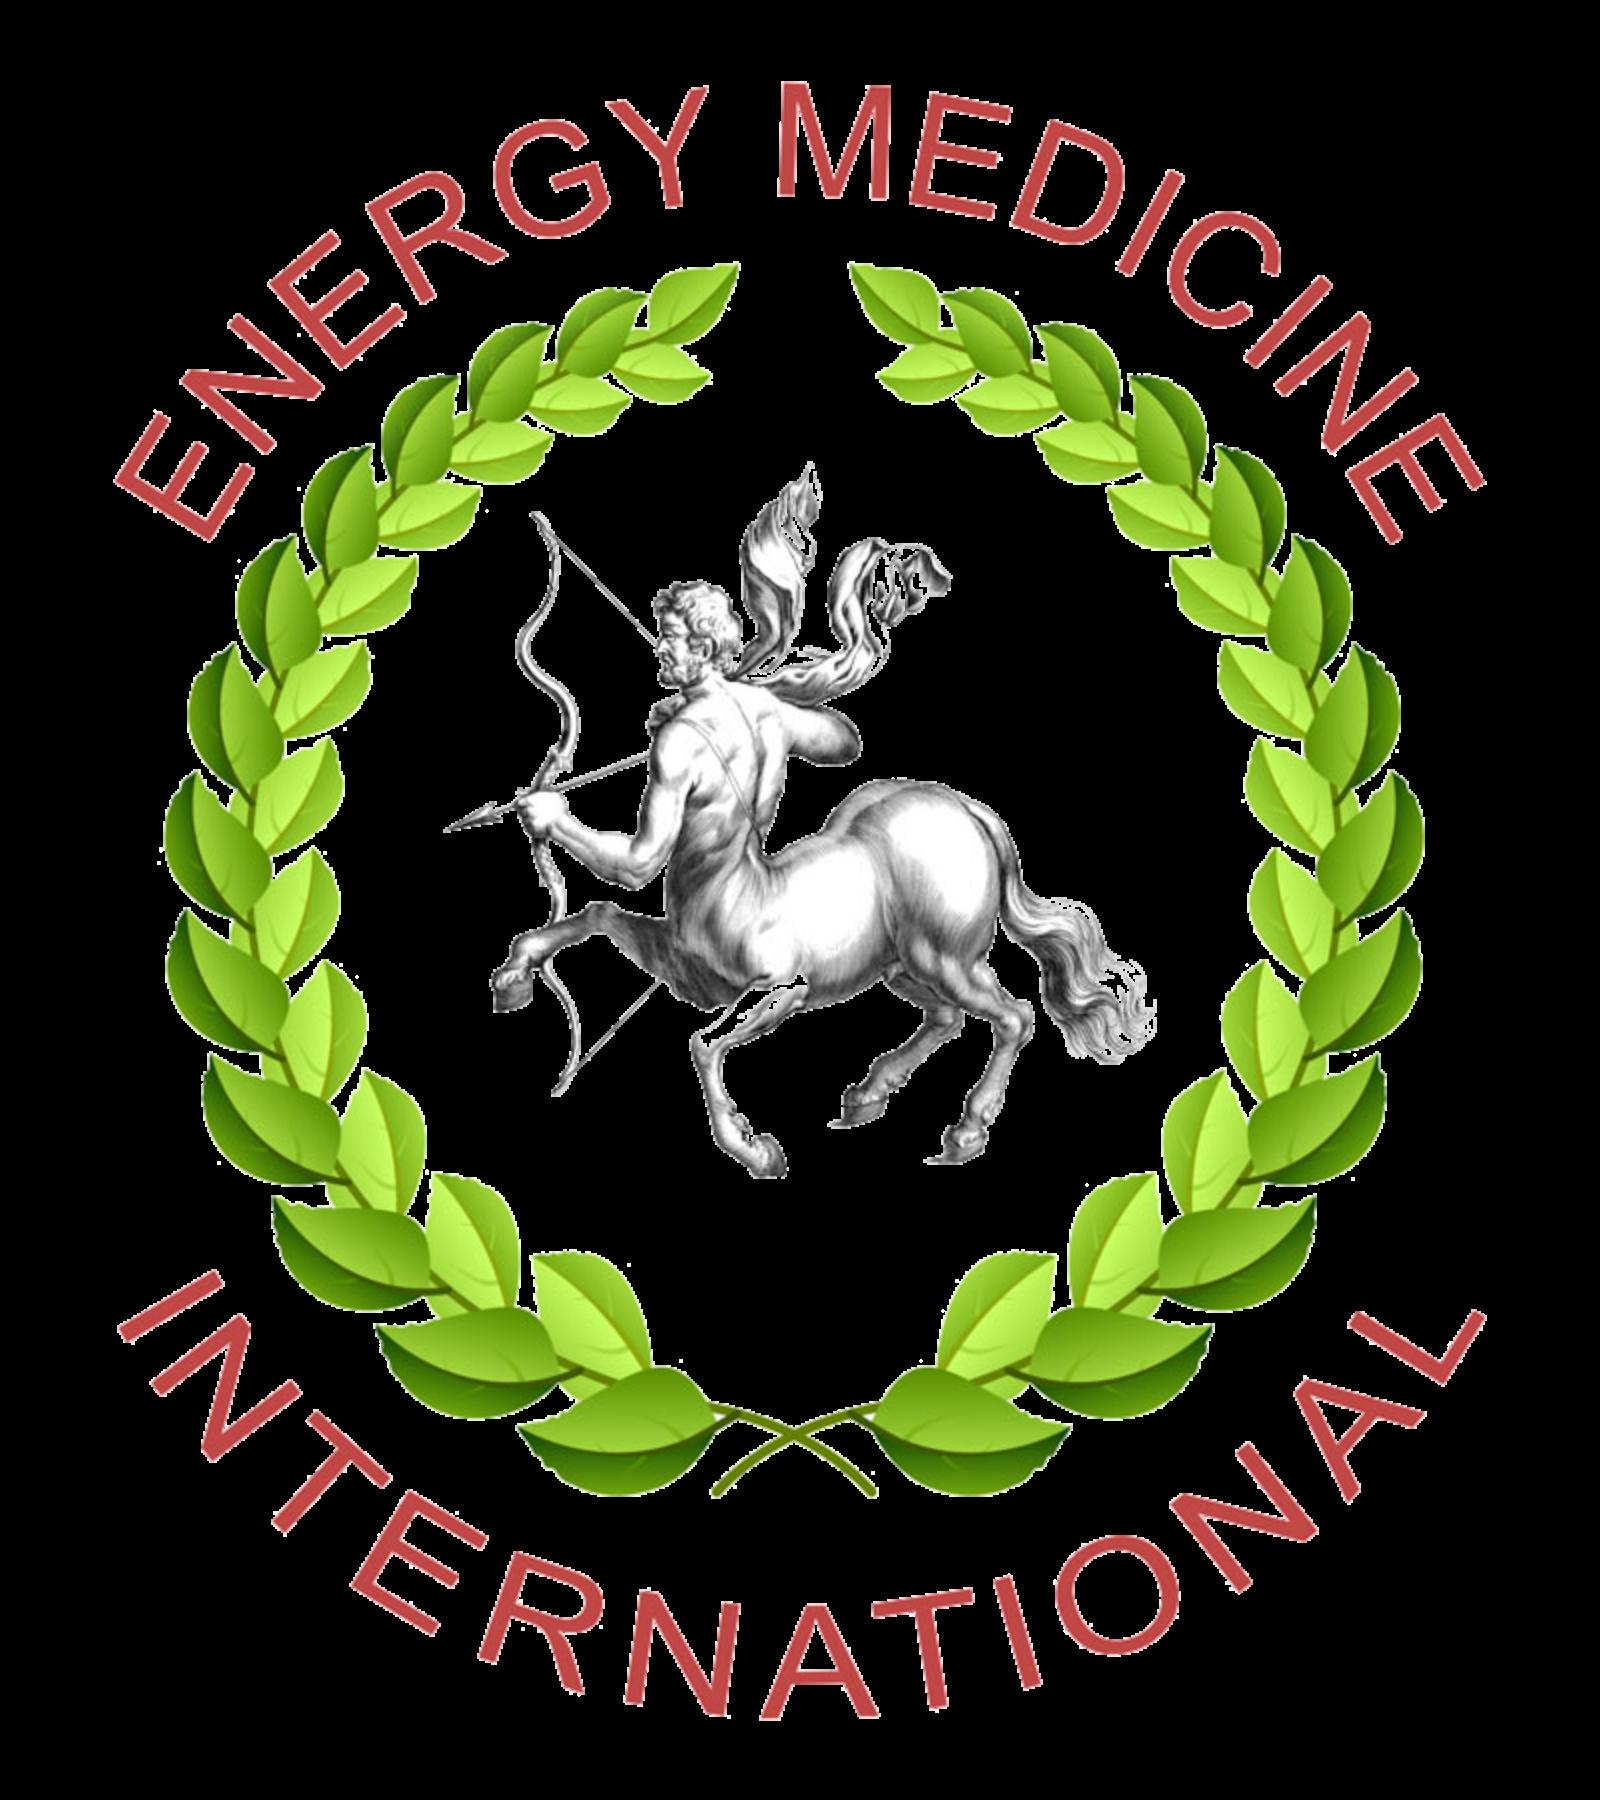 ENERGY MEDICINE INTERNATIONAL